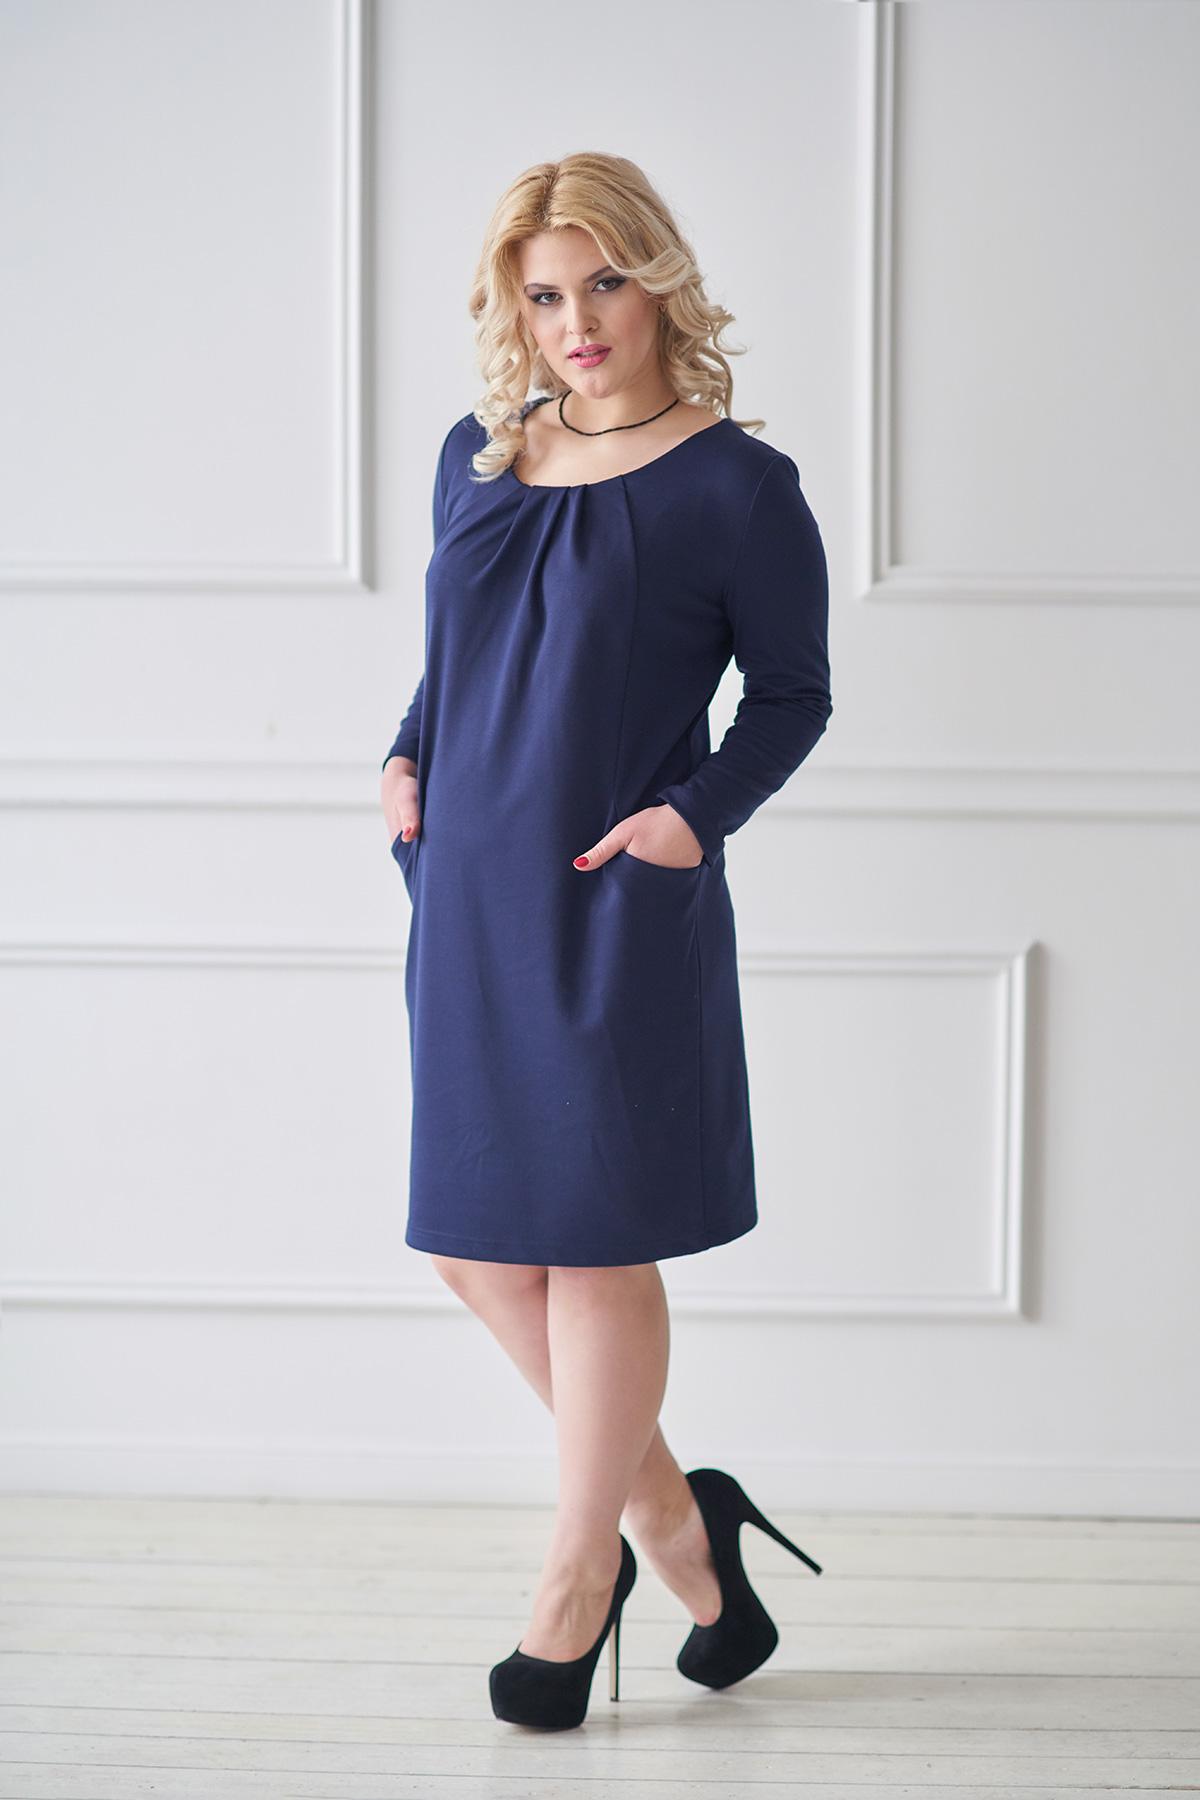 Жен. платье арт. 19-0031 Синий р. 56 - Женская одежда артикул: 34553